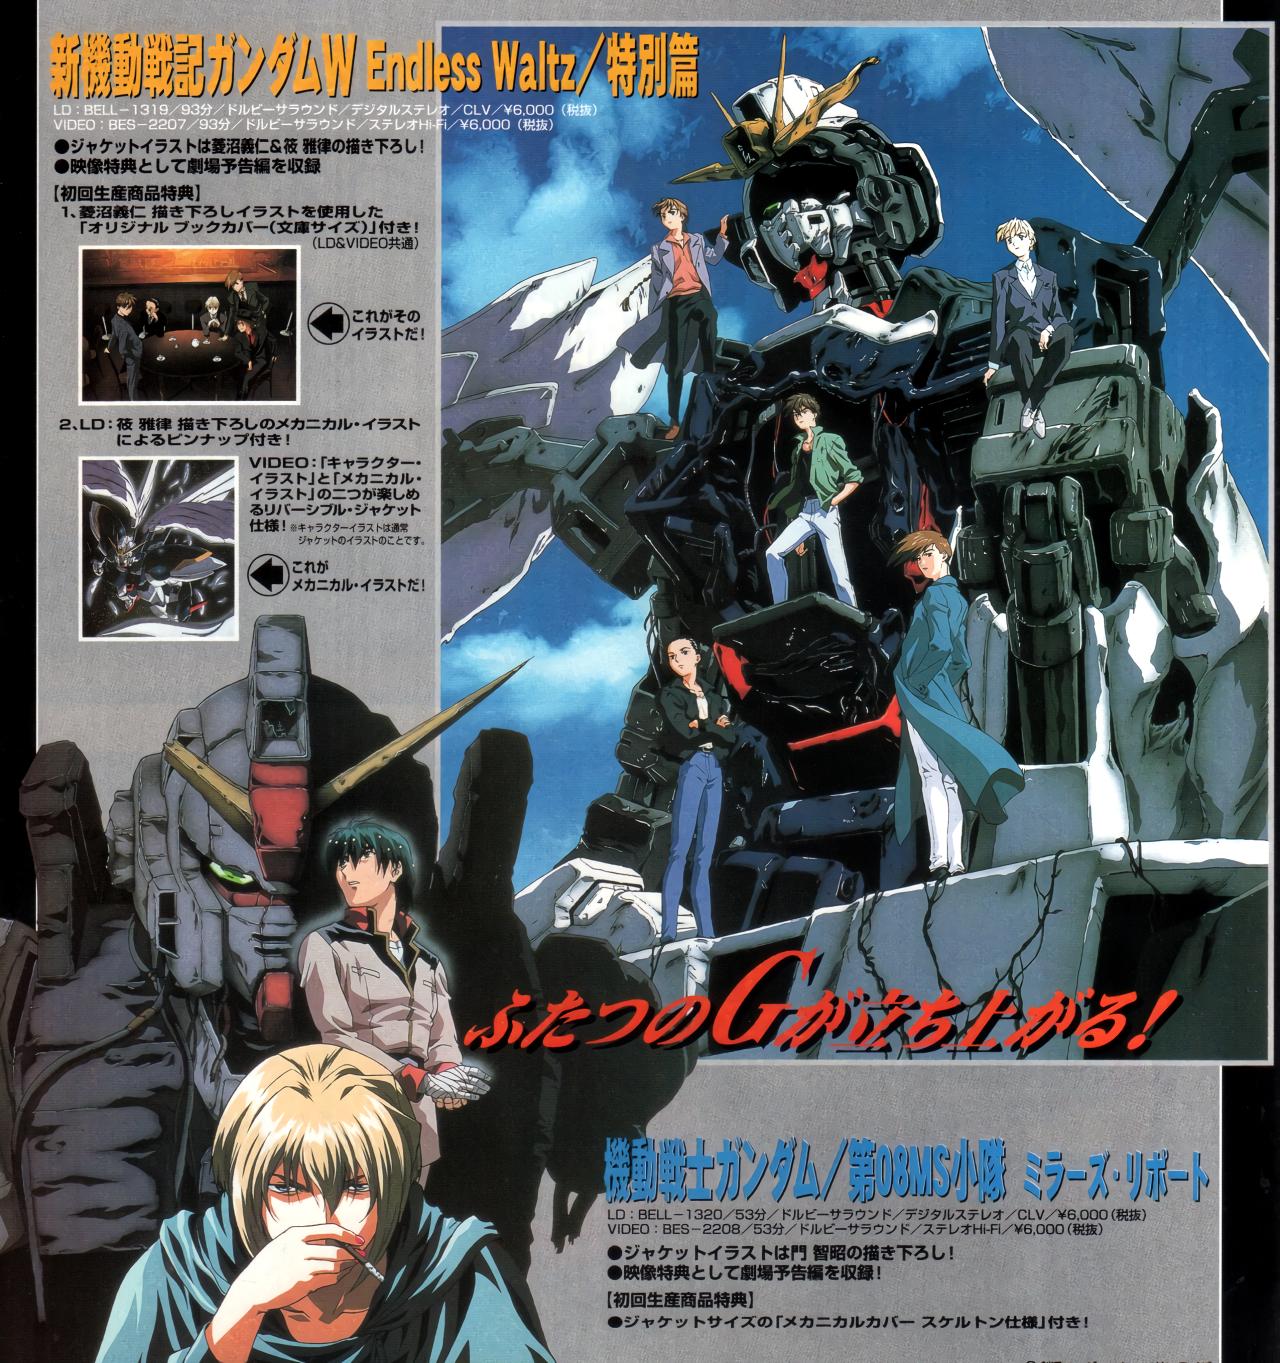 Animage 02 1999 Mobile Suit Gundam The 08th Ms Team Miller S Report And Gundam Wing Endless Waltz Gundam Gundam Wing Ms Teams